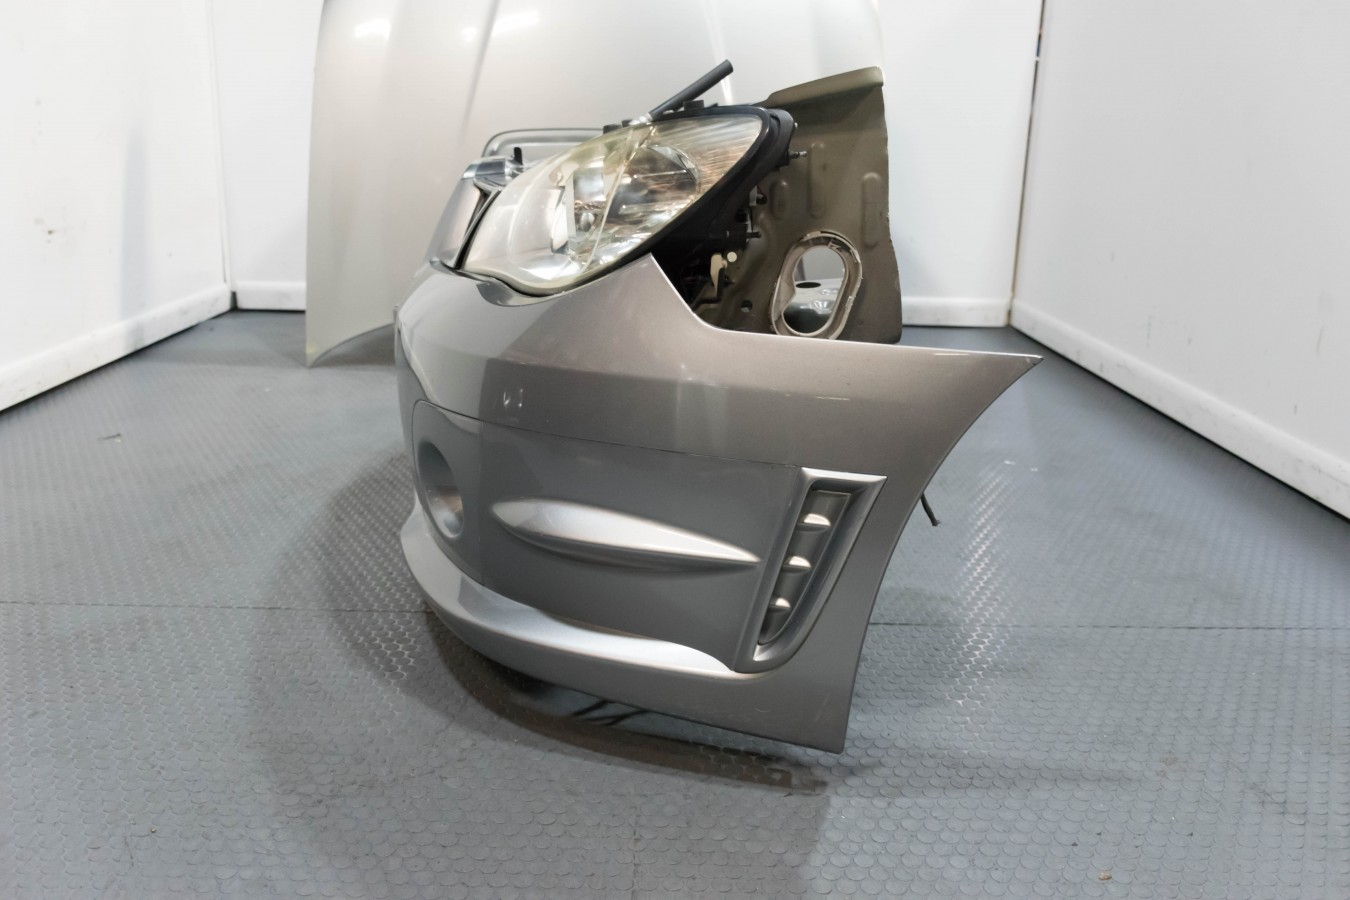 2006 2007 Impreza WRX STi Nose Cut With HID Headlights ...